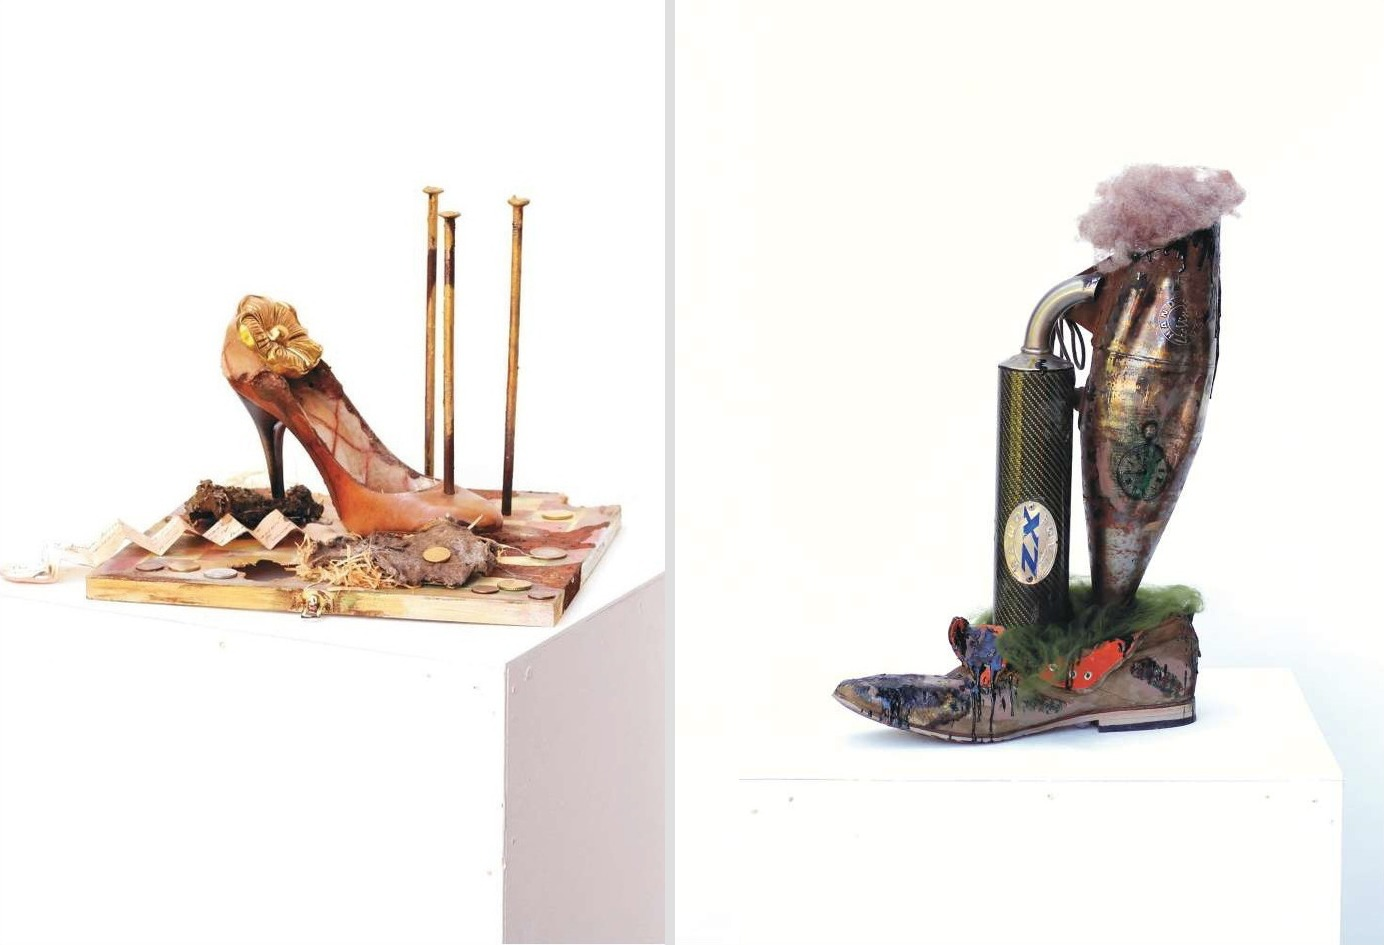 Elena Ennikova Creates Fascinating Sculptures Inspired by Shoes